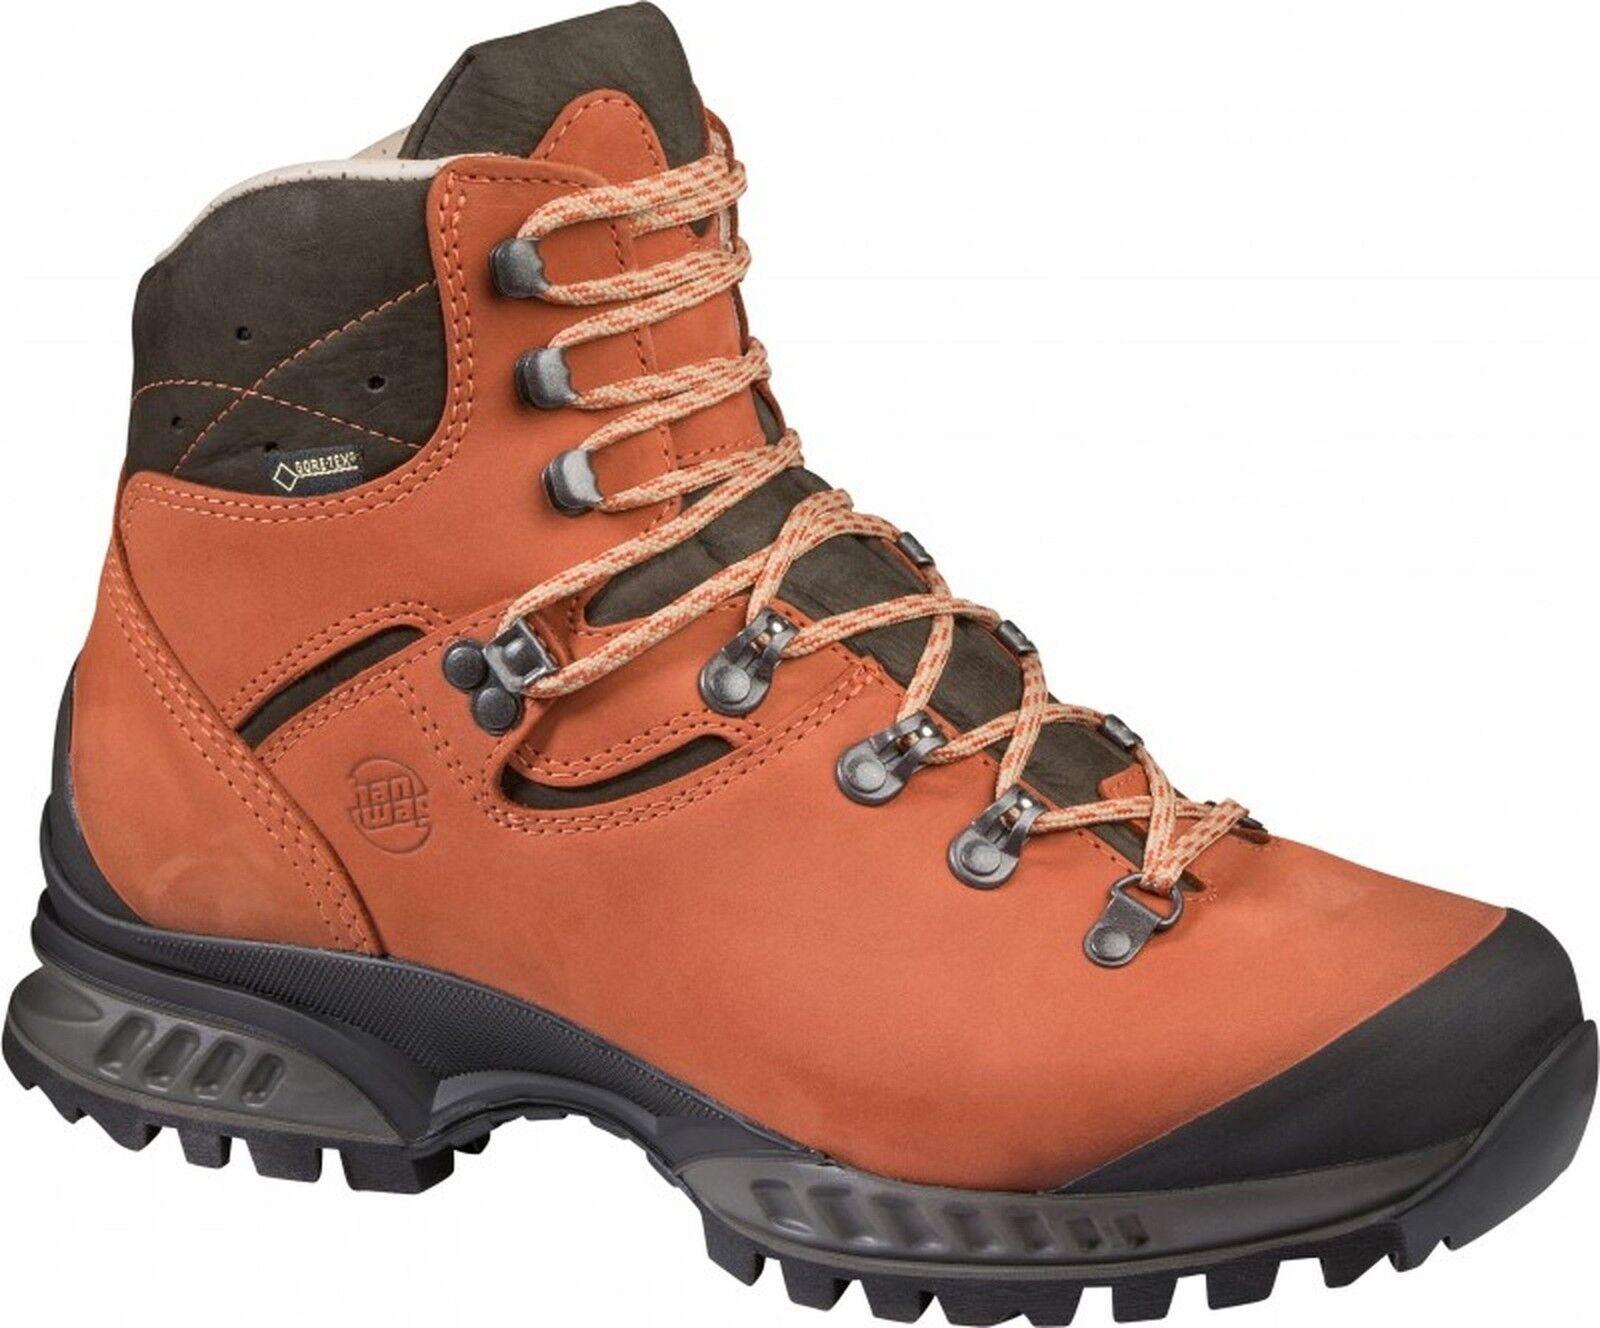 Hanwag Zapatos de Montaña  Tatra Mujer GTX Gore-Tex Tamaño 4,5-37,5 Hoja Otoño